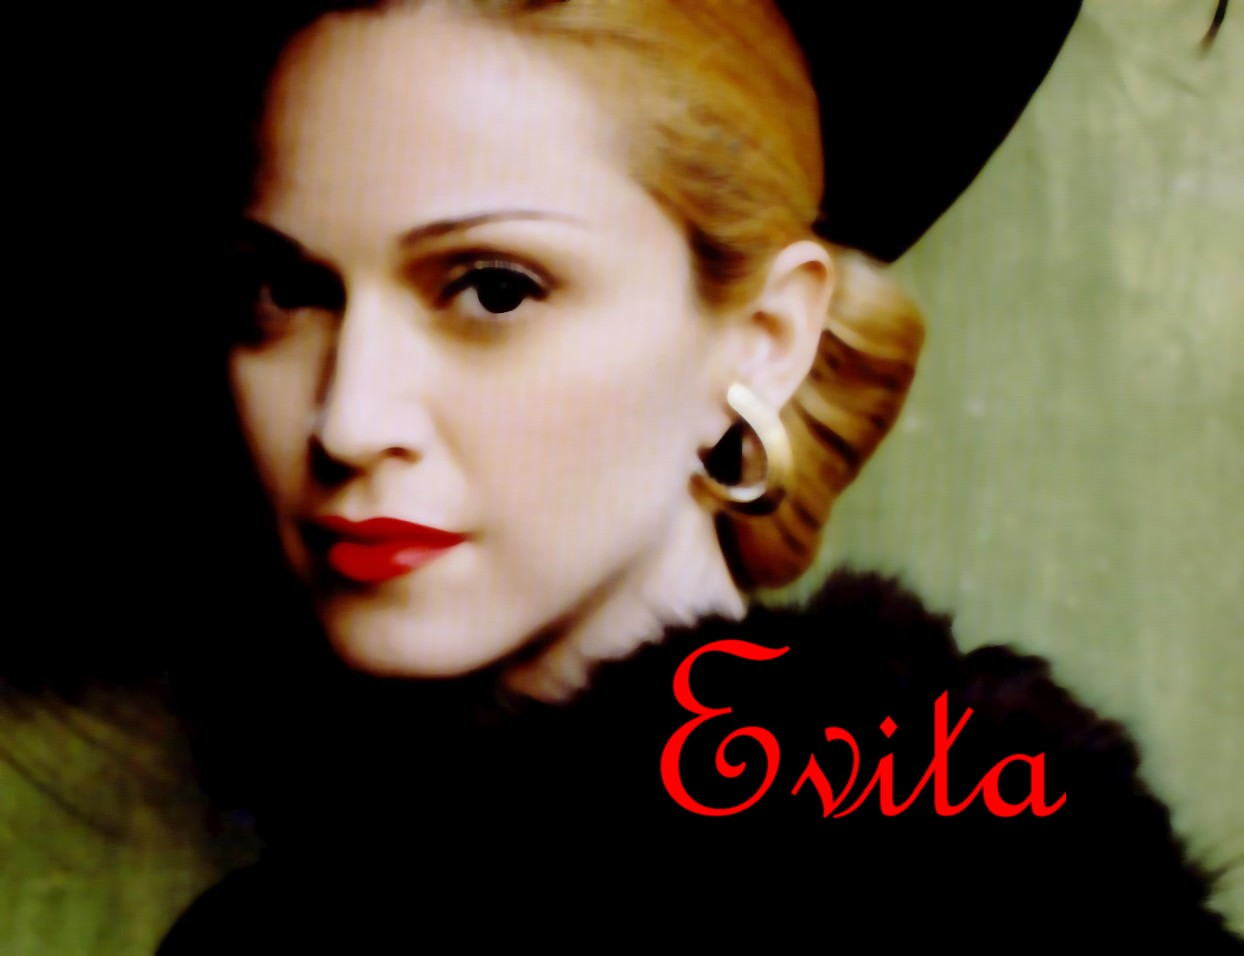 Evita The Complete Motion Picture Music Soundtrack